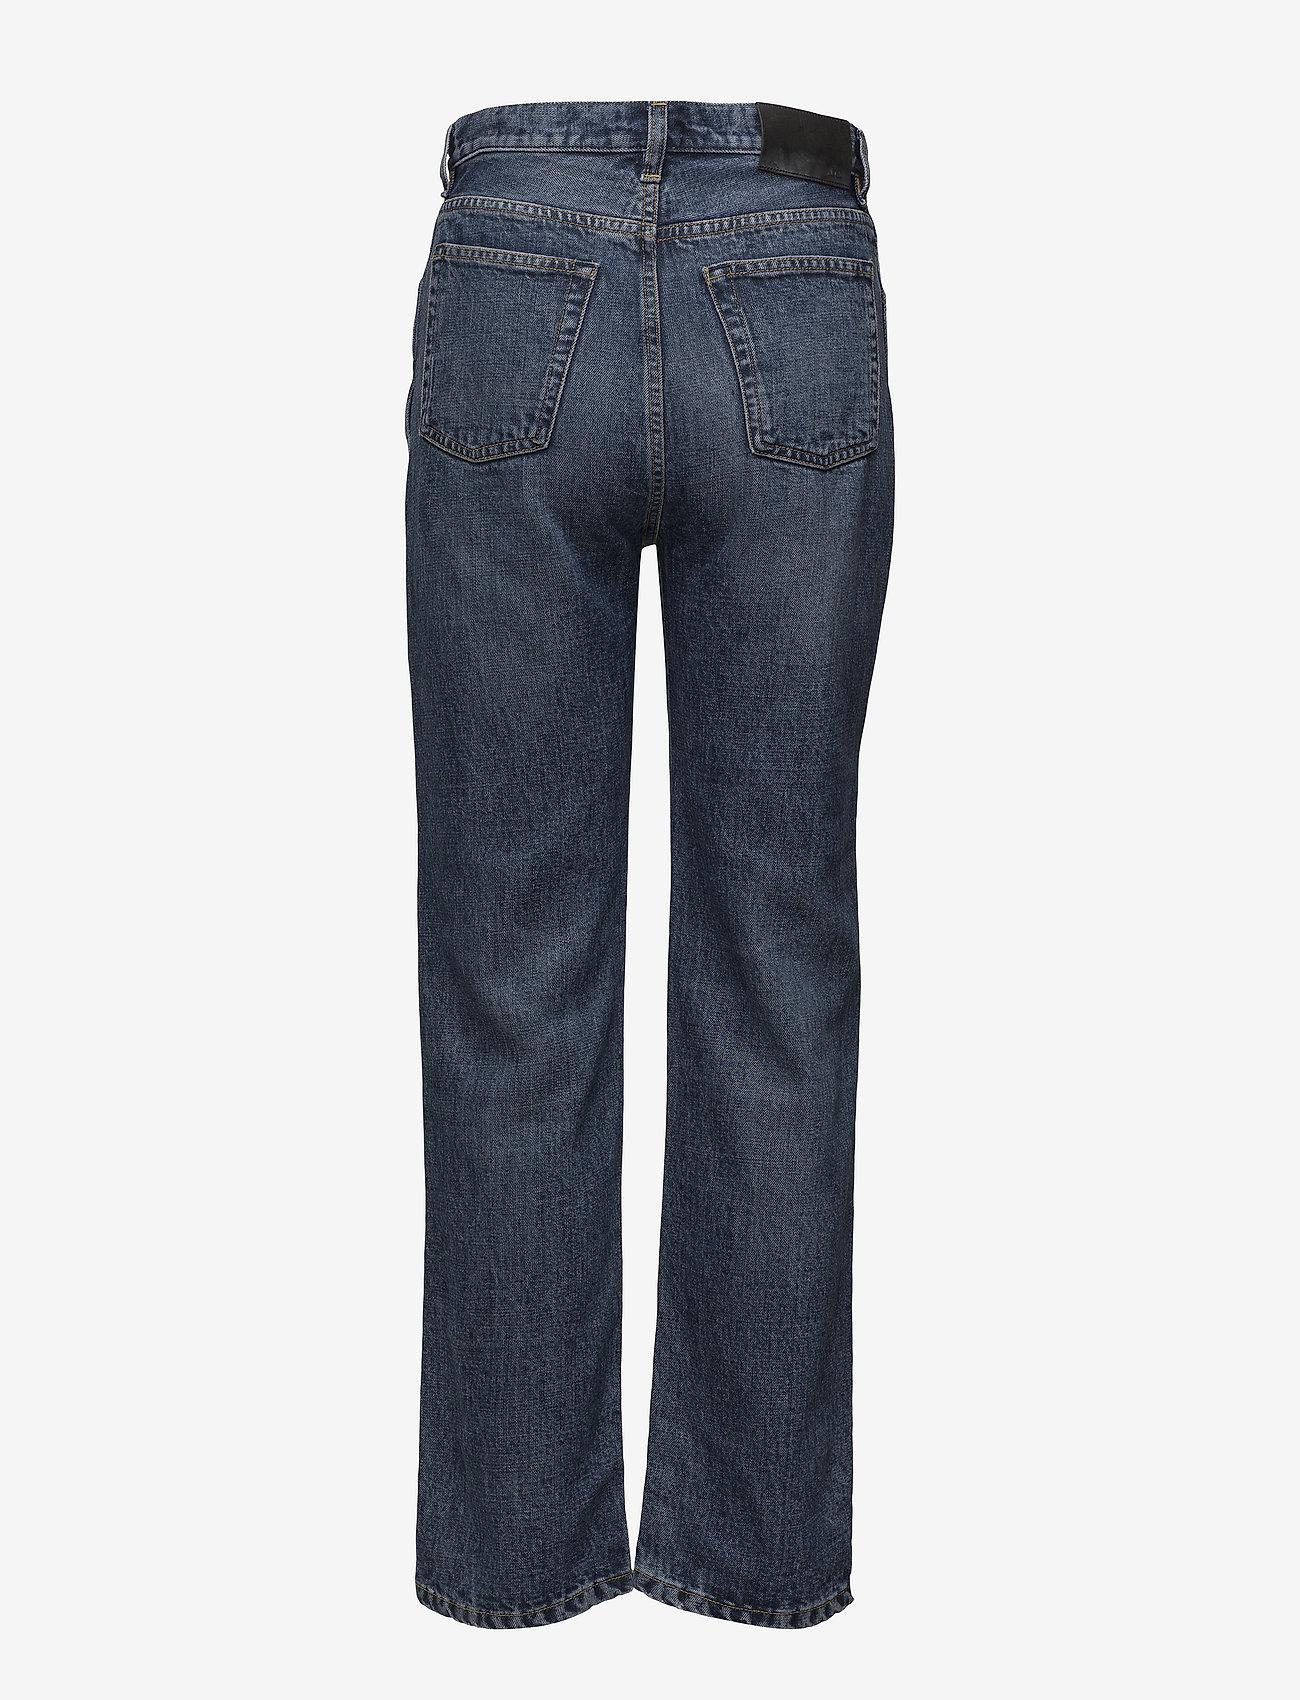 J. Lindeberg - Beltran Beyond - boyfriend jeans - mid blue - 1